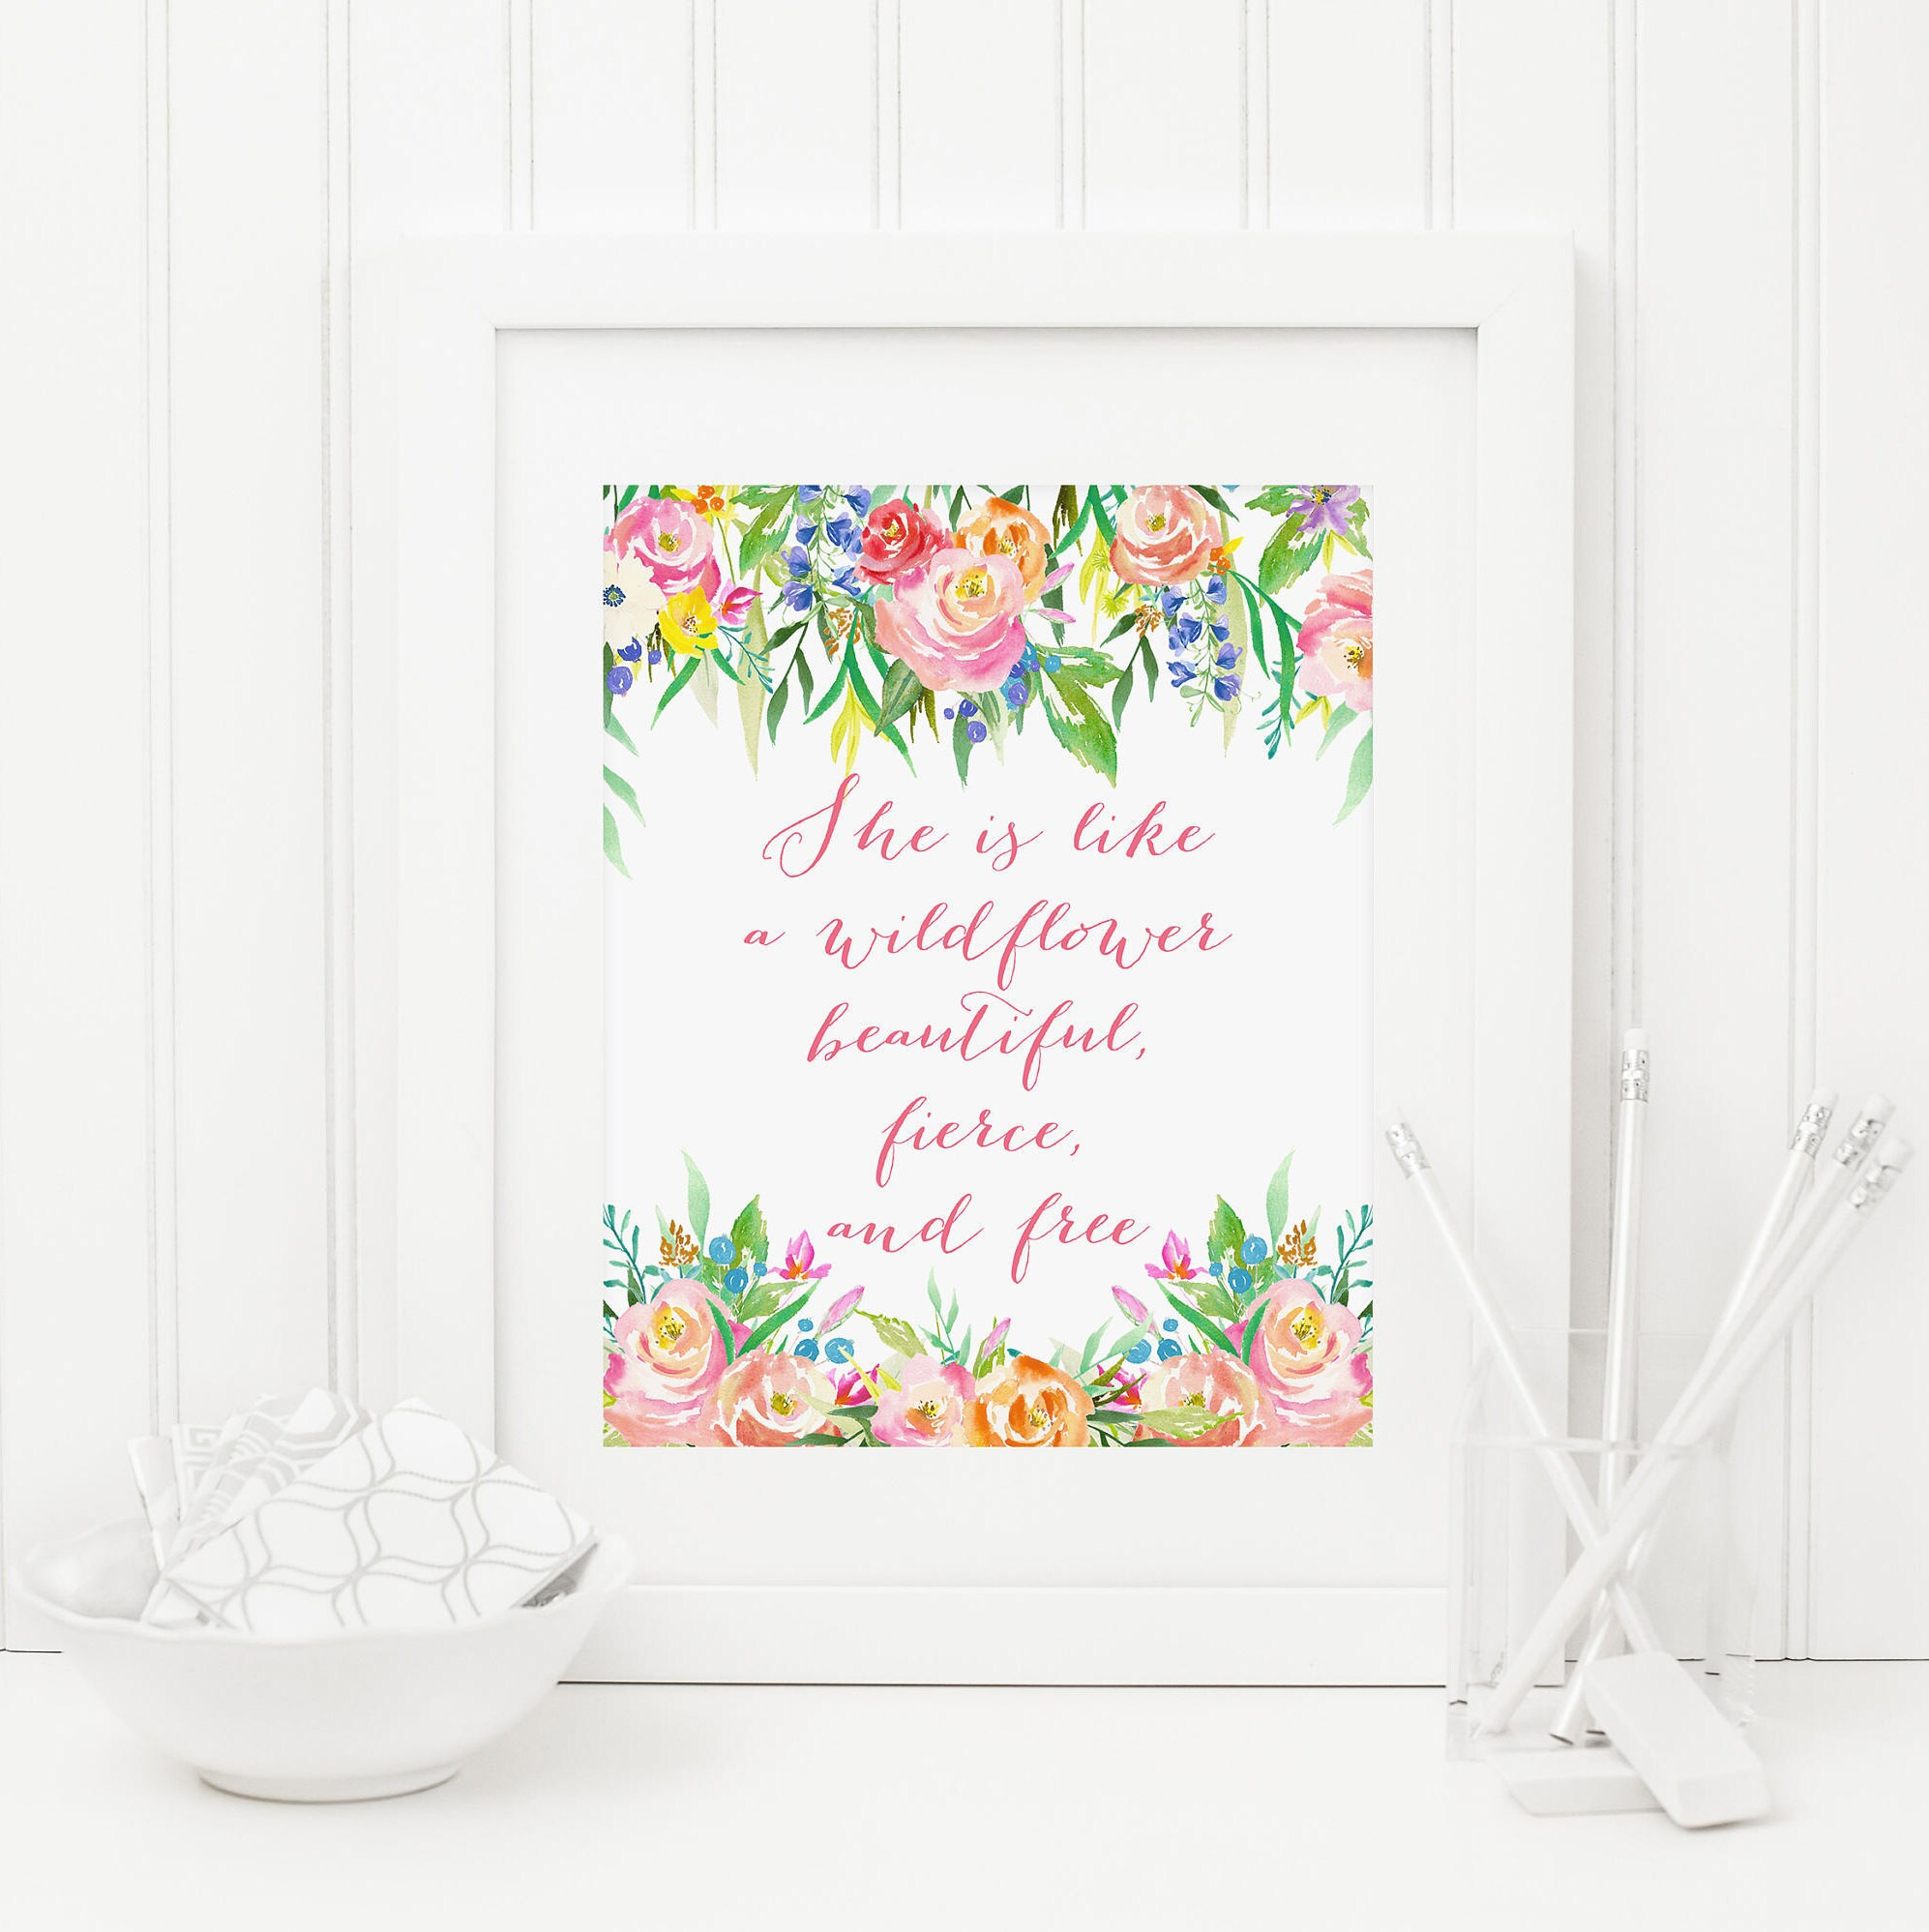 she is like a wildflower beautiful fierce and free printable